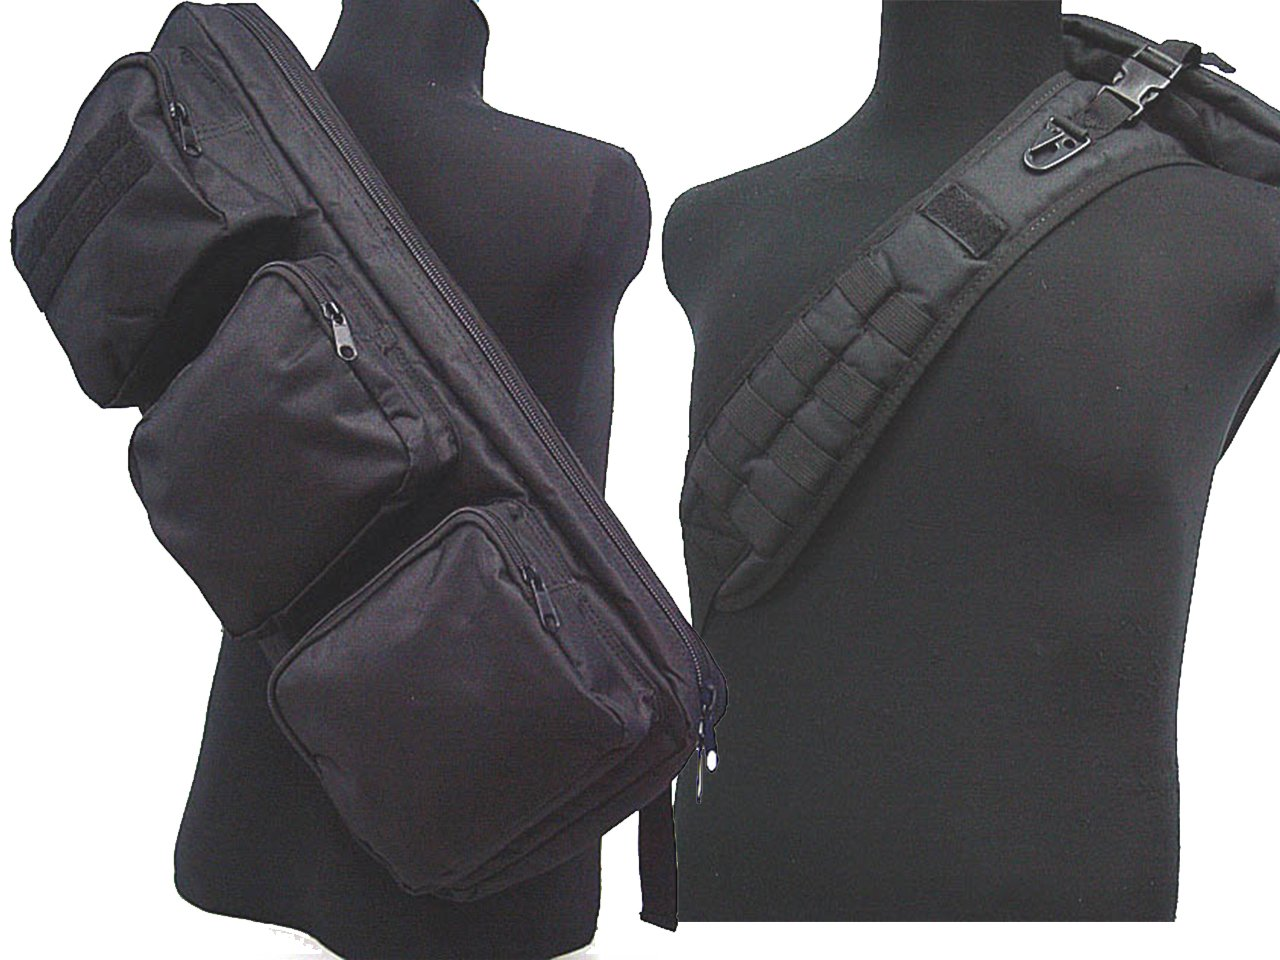 24Rifle MP5bolsa bandolera mochila de hombro Gear Airsoft Militar Negro